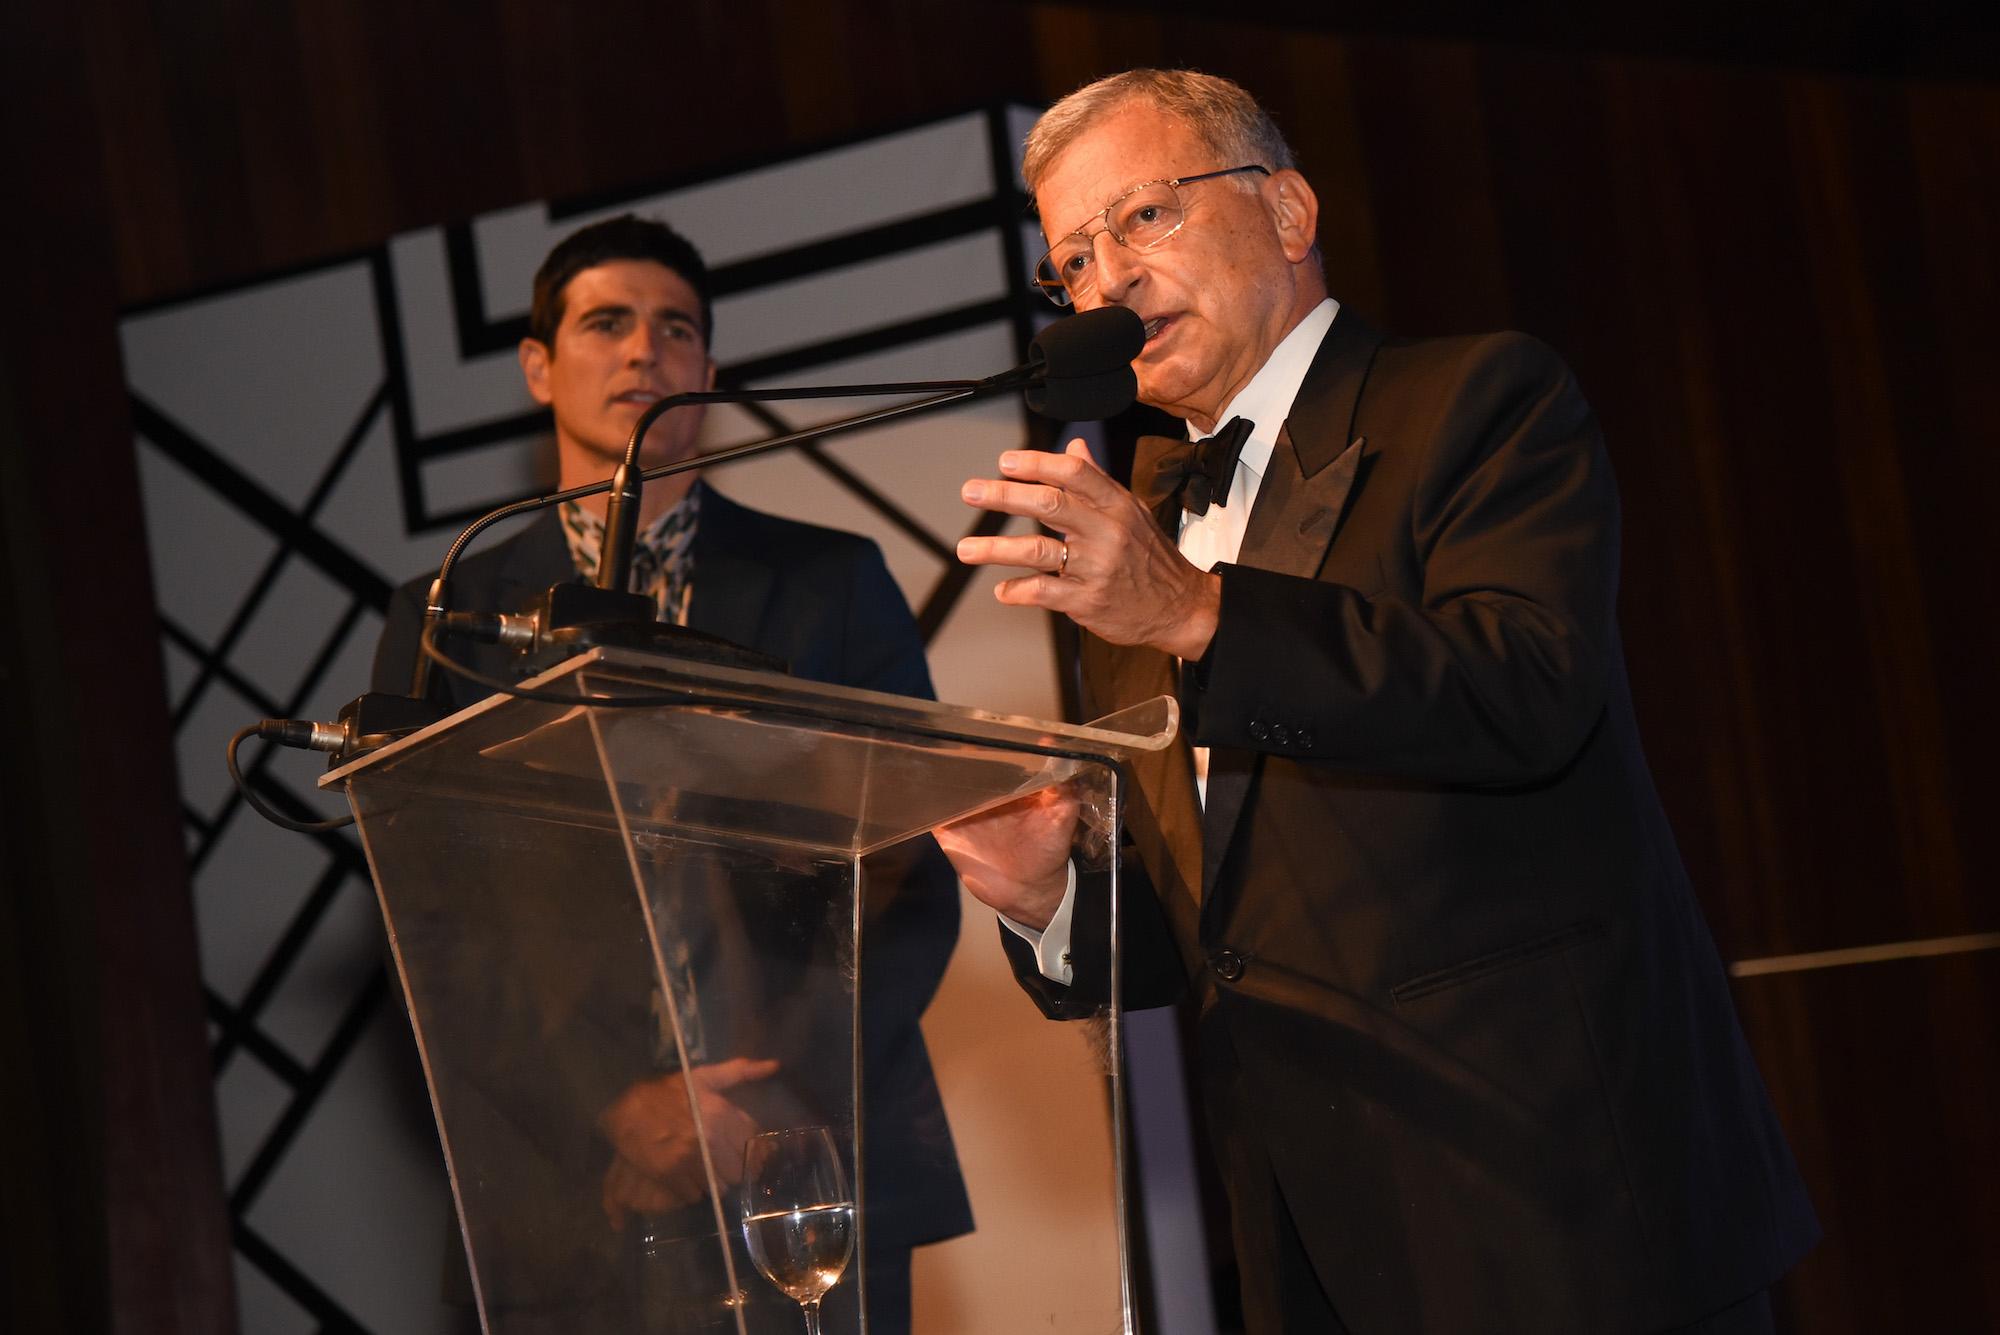 Claudio Haddad V BrazilFoundation Gala São Paulo Chanel 2018 Filantropia Brasil Philanthropy Brazil